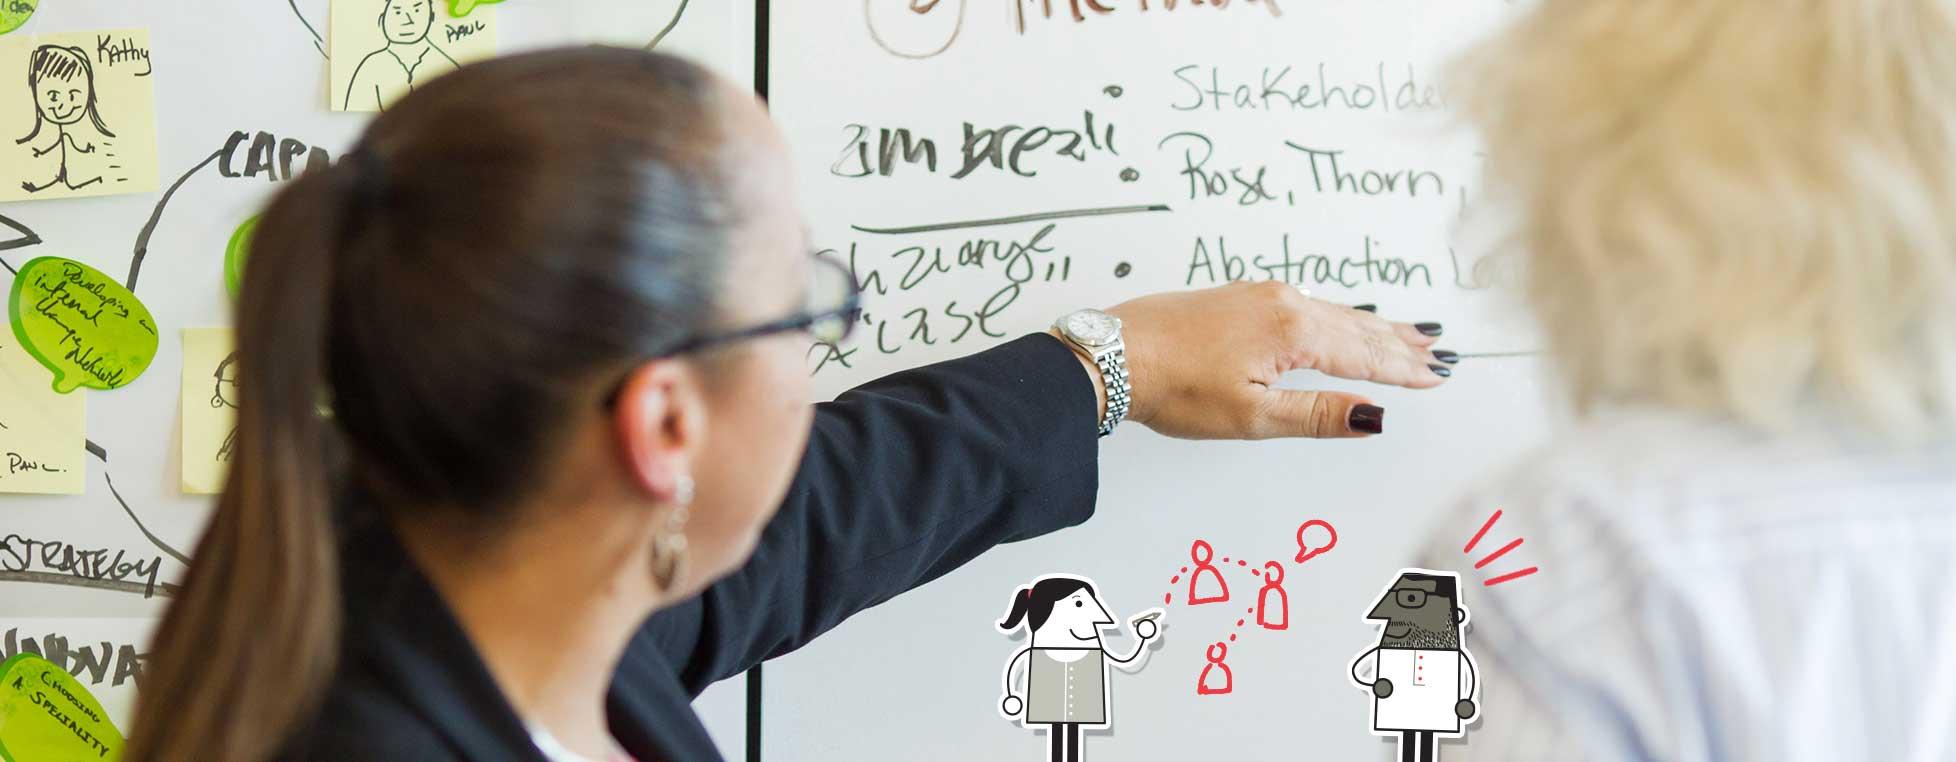 Schedule for LUMA Design Thinking Workshops | LUMA Institute